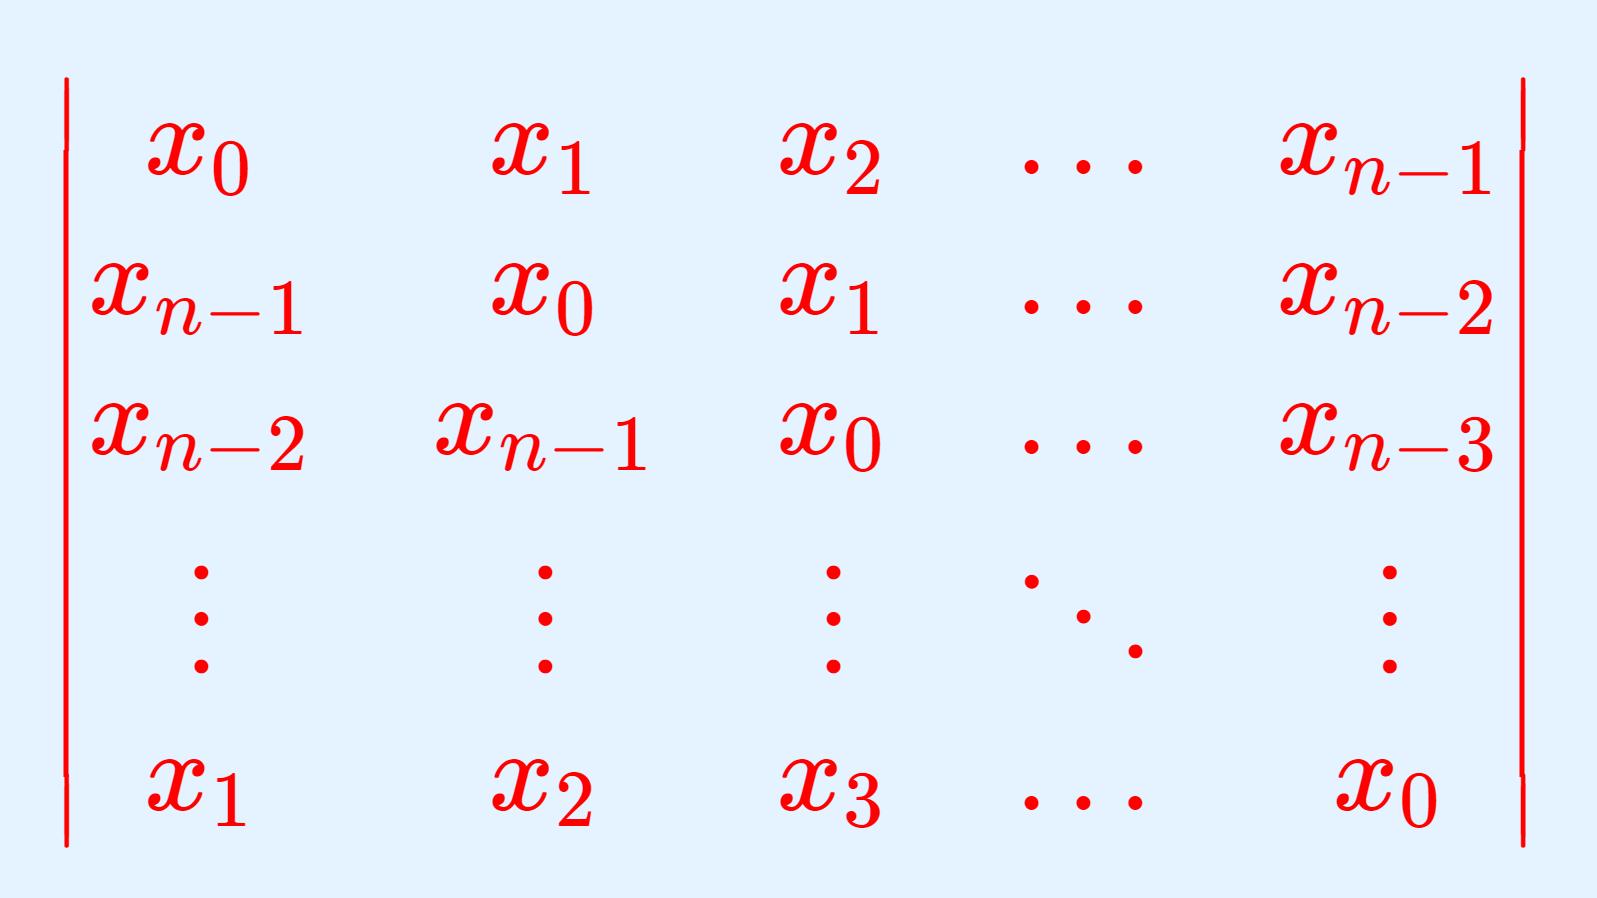 巡回行列式の計算